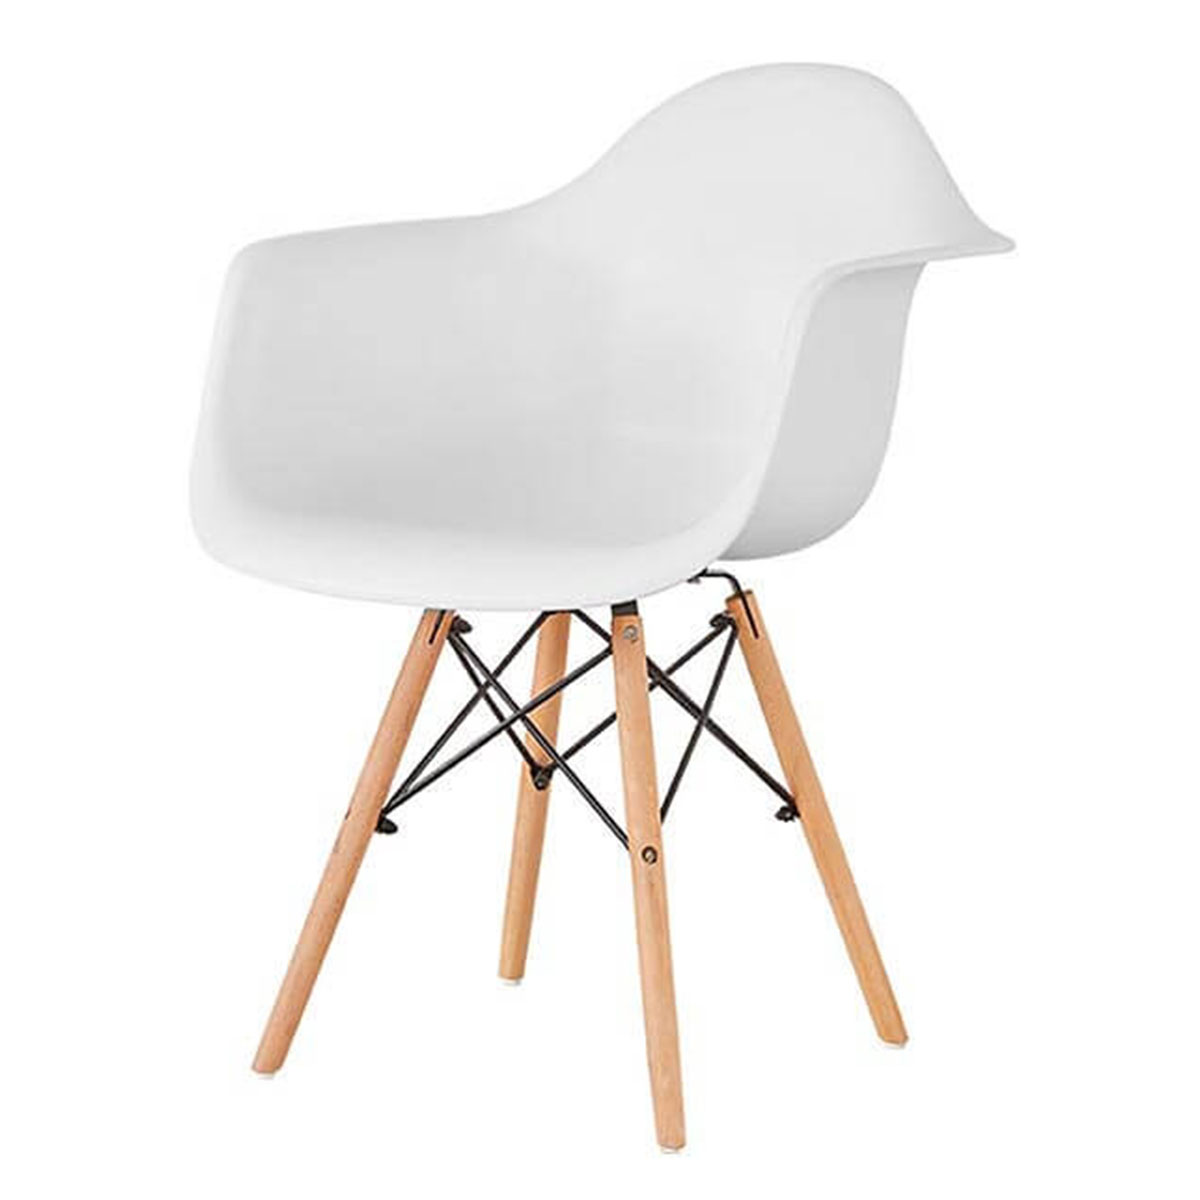 Stolica bela MU19-003